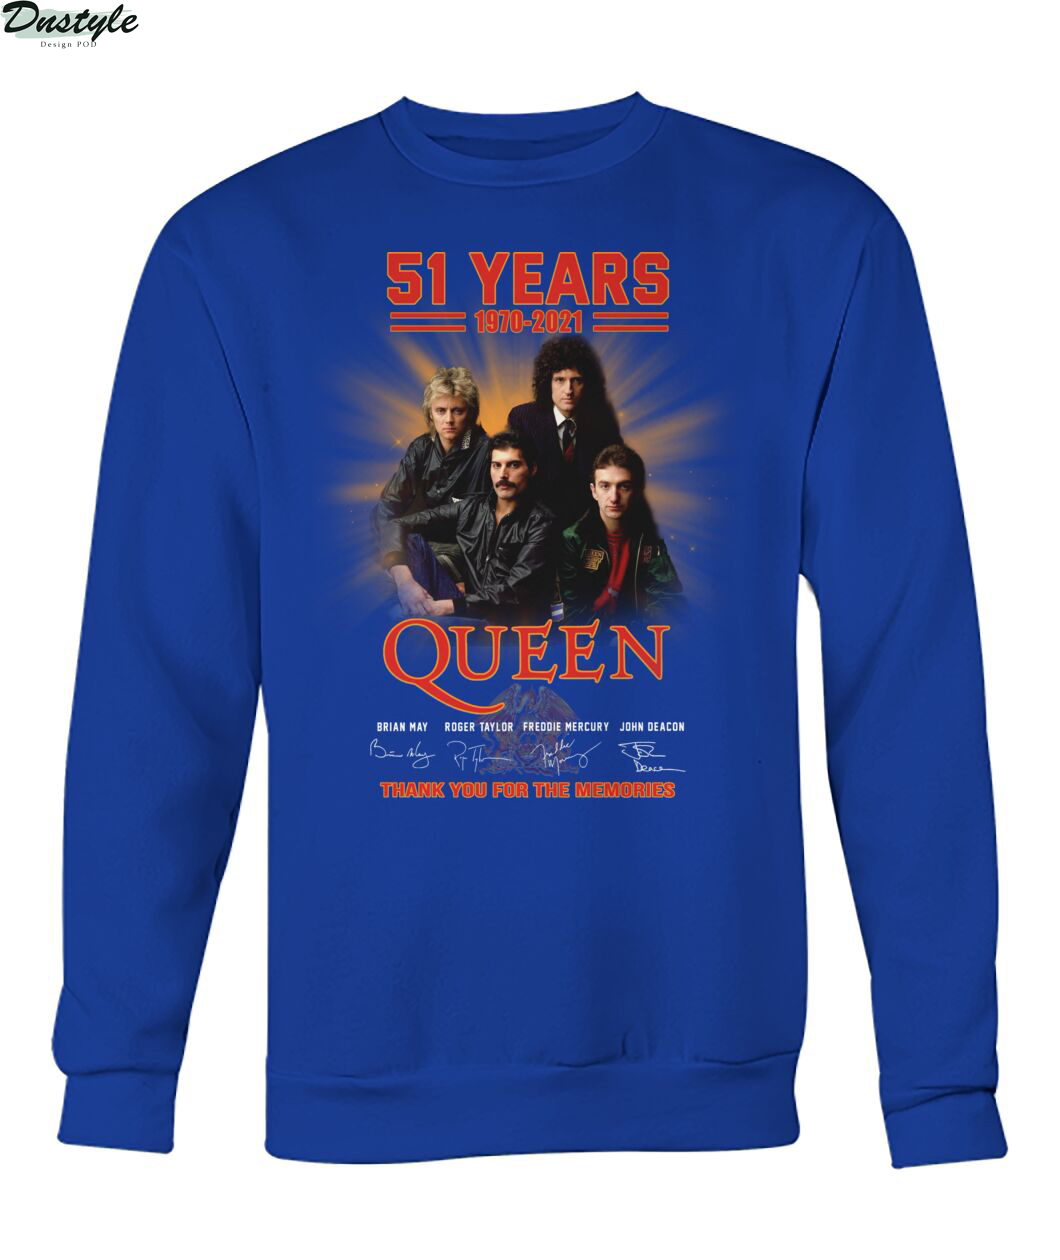 51 years 1979 2021 Queen thank you for the memories sweatshirt